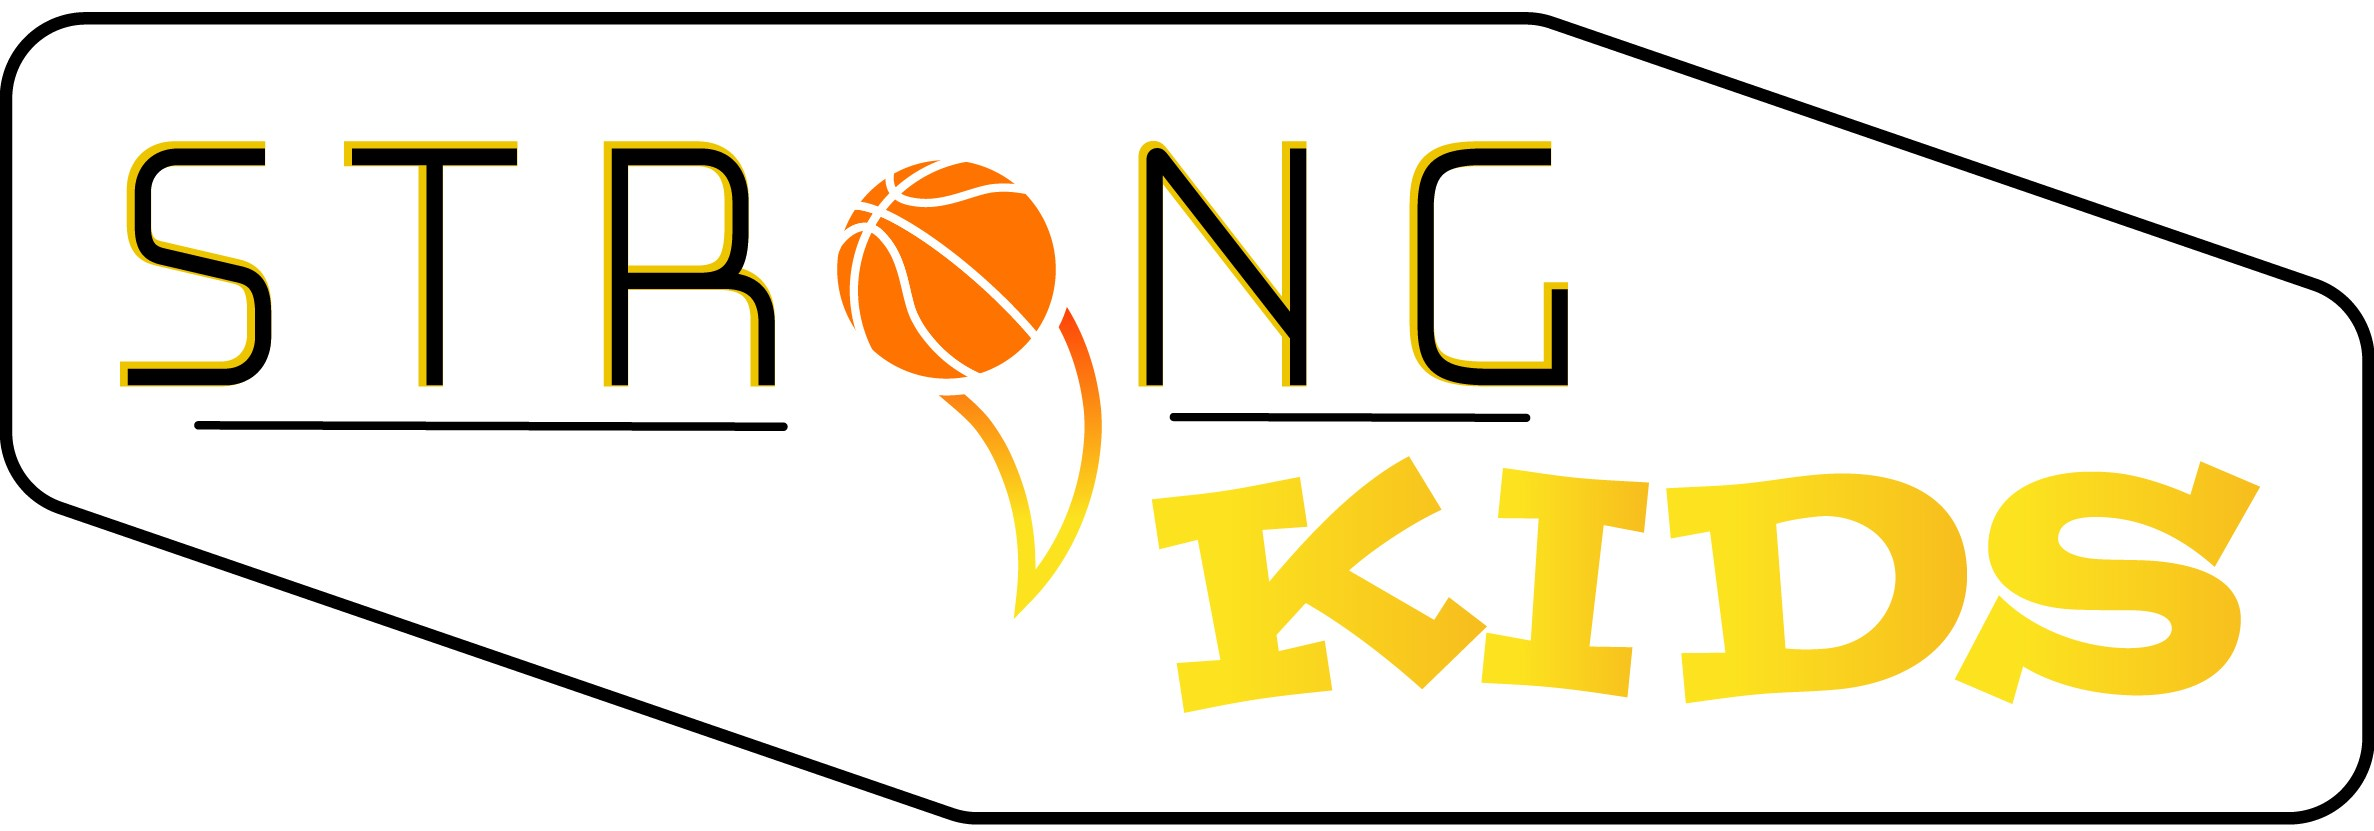 Логотип для Детского Интернет Магазина StrongKids фото f_2265c72ae2bccf37.jpg